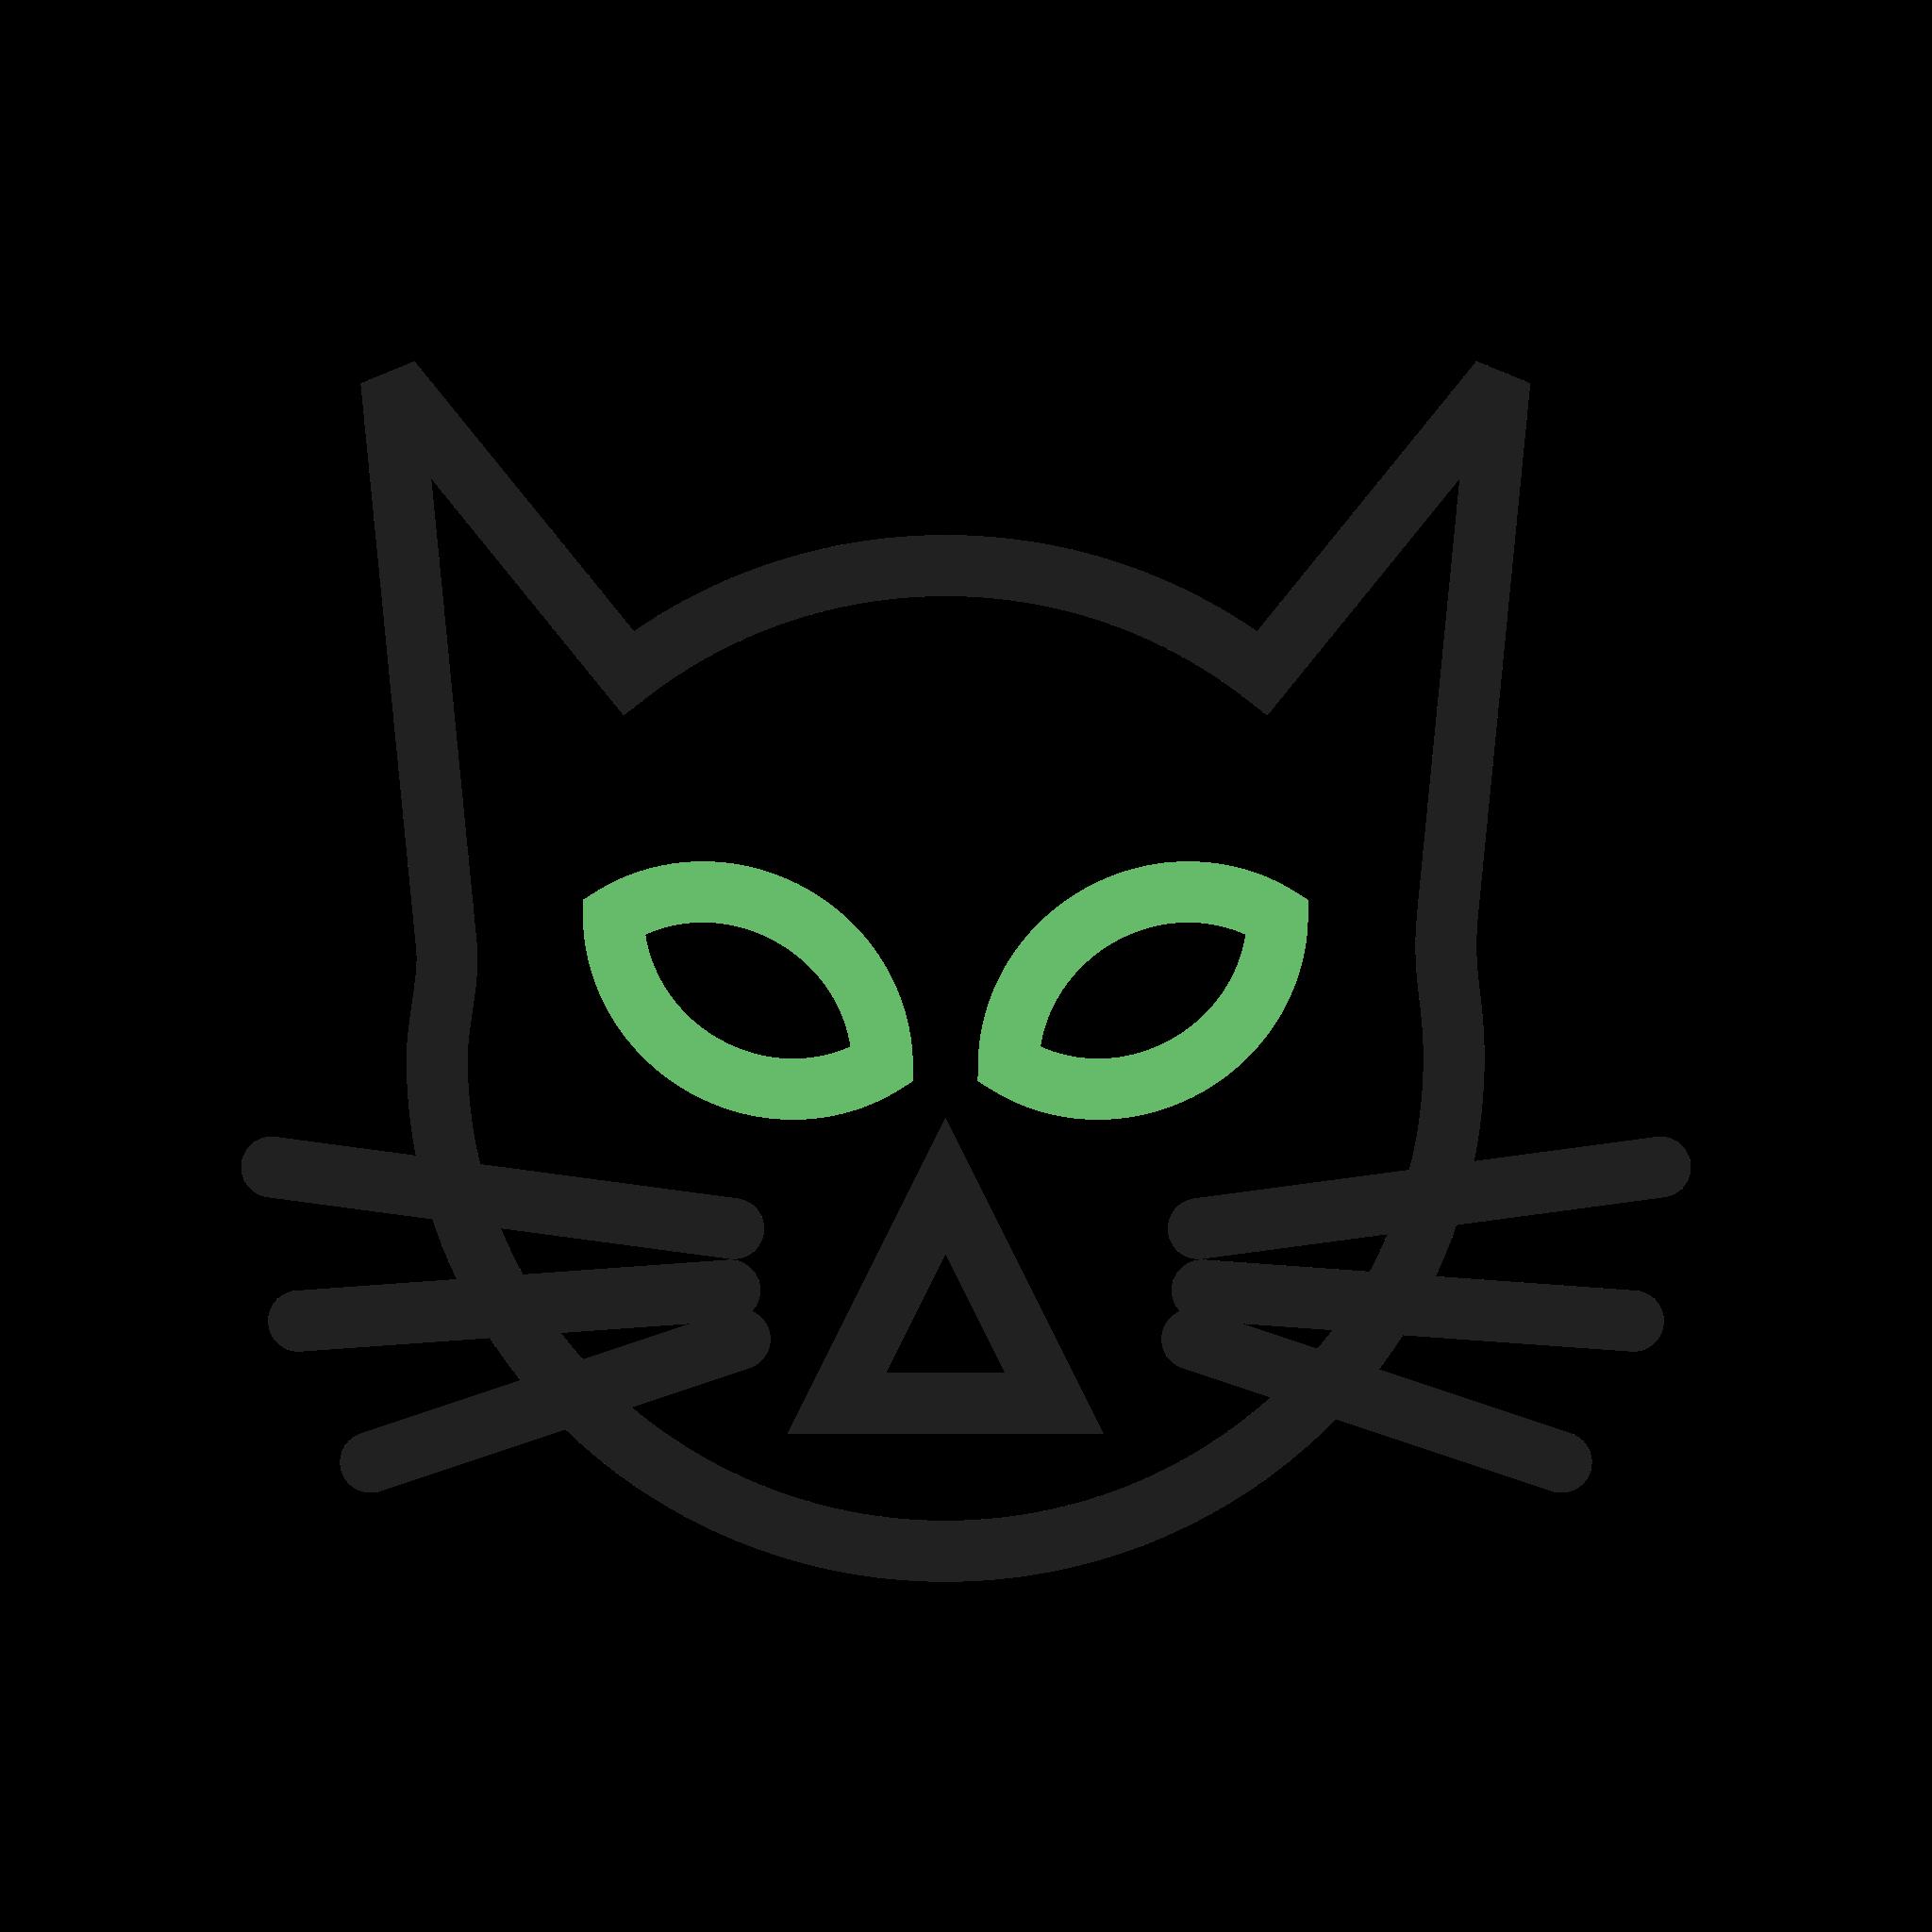 reshot-icon-cat-J4AXUBC9LF